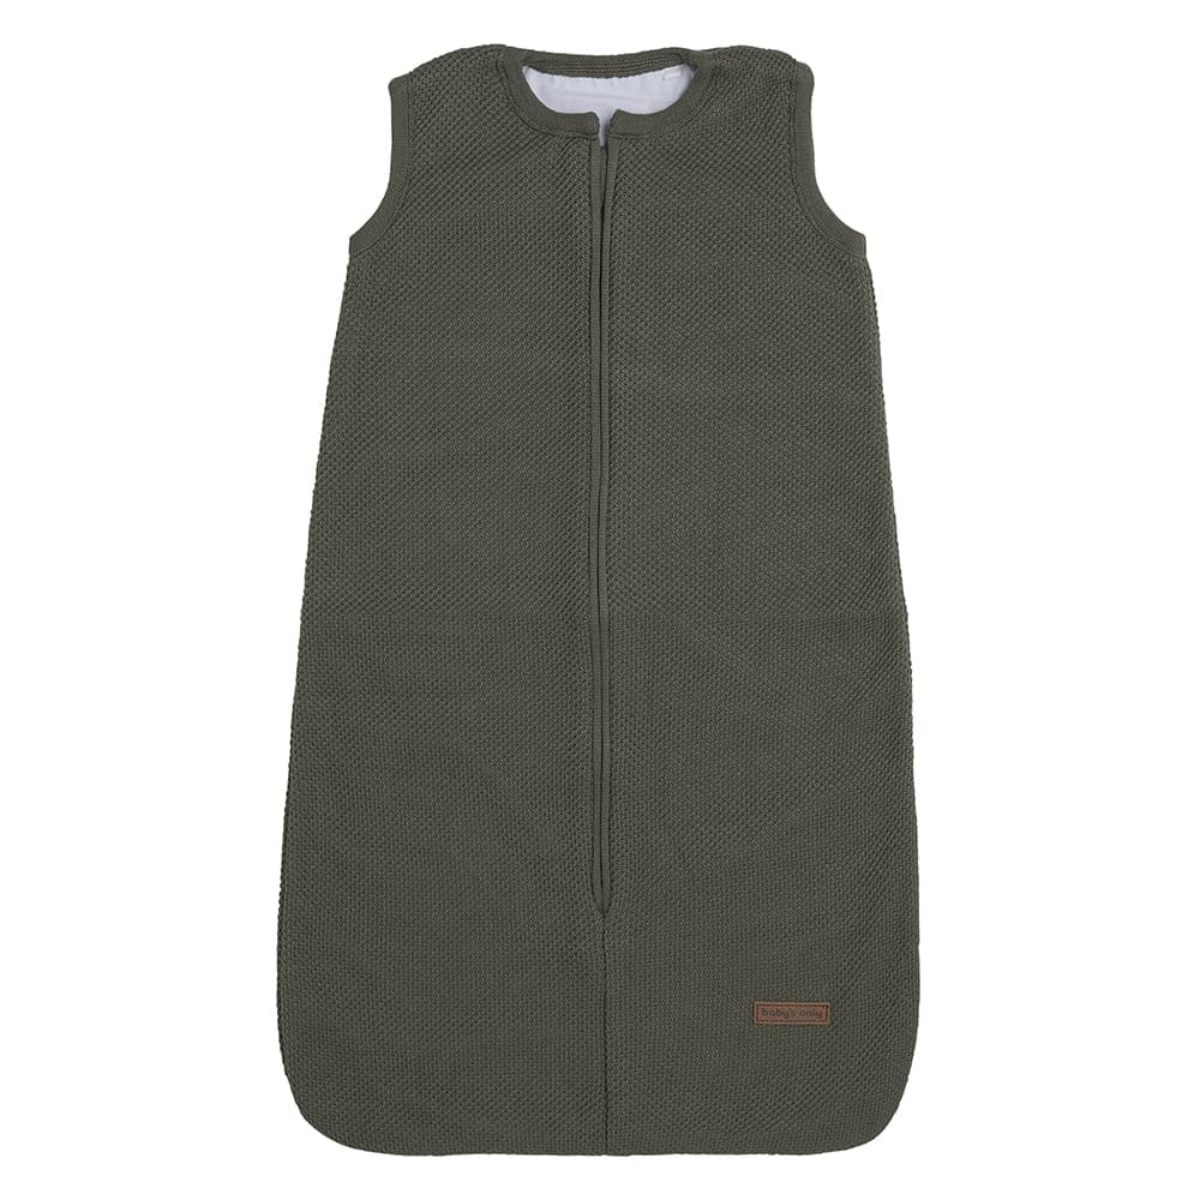 sleeping bag classic khaki 70 cm